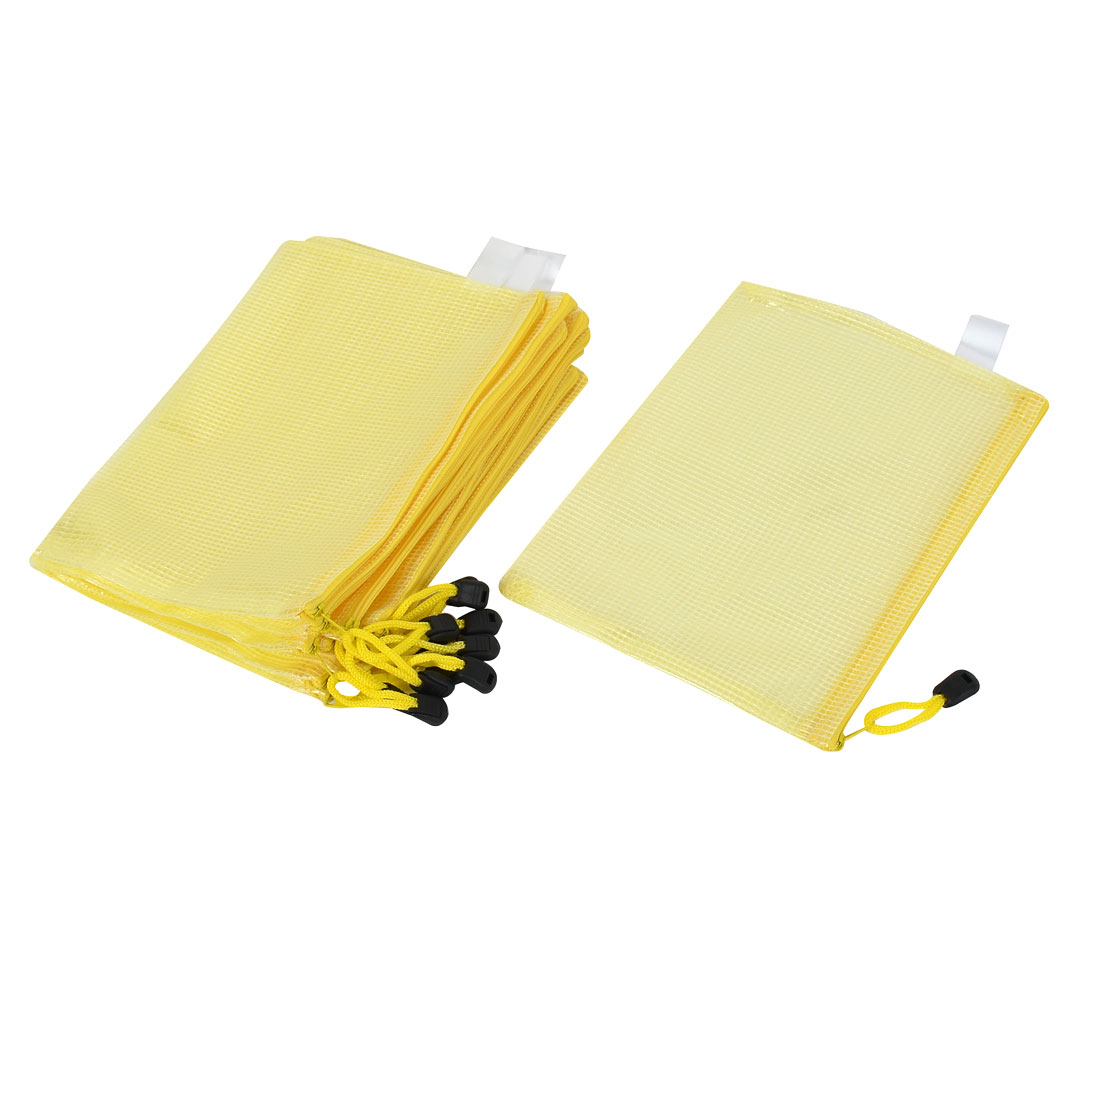 Office Waterproof A5 Document File Zippy Folder Holder Bag Yellow 12pcs